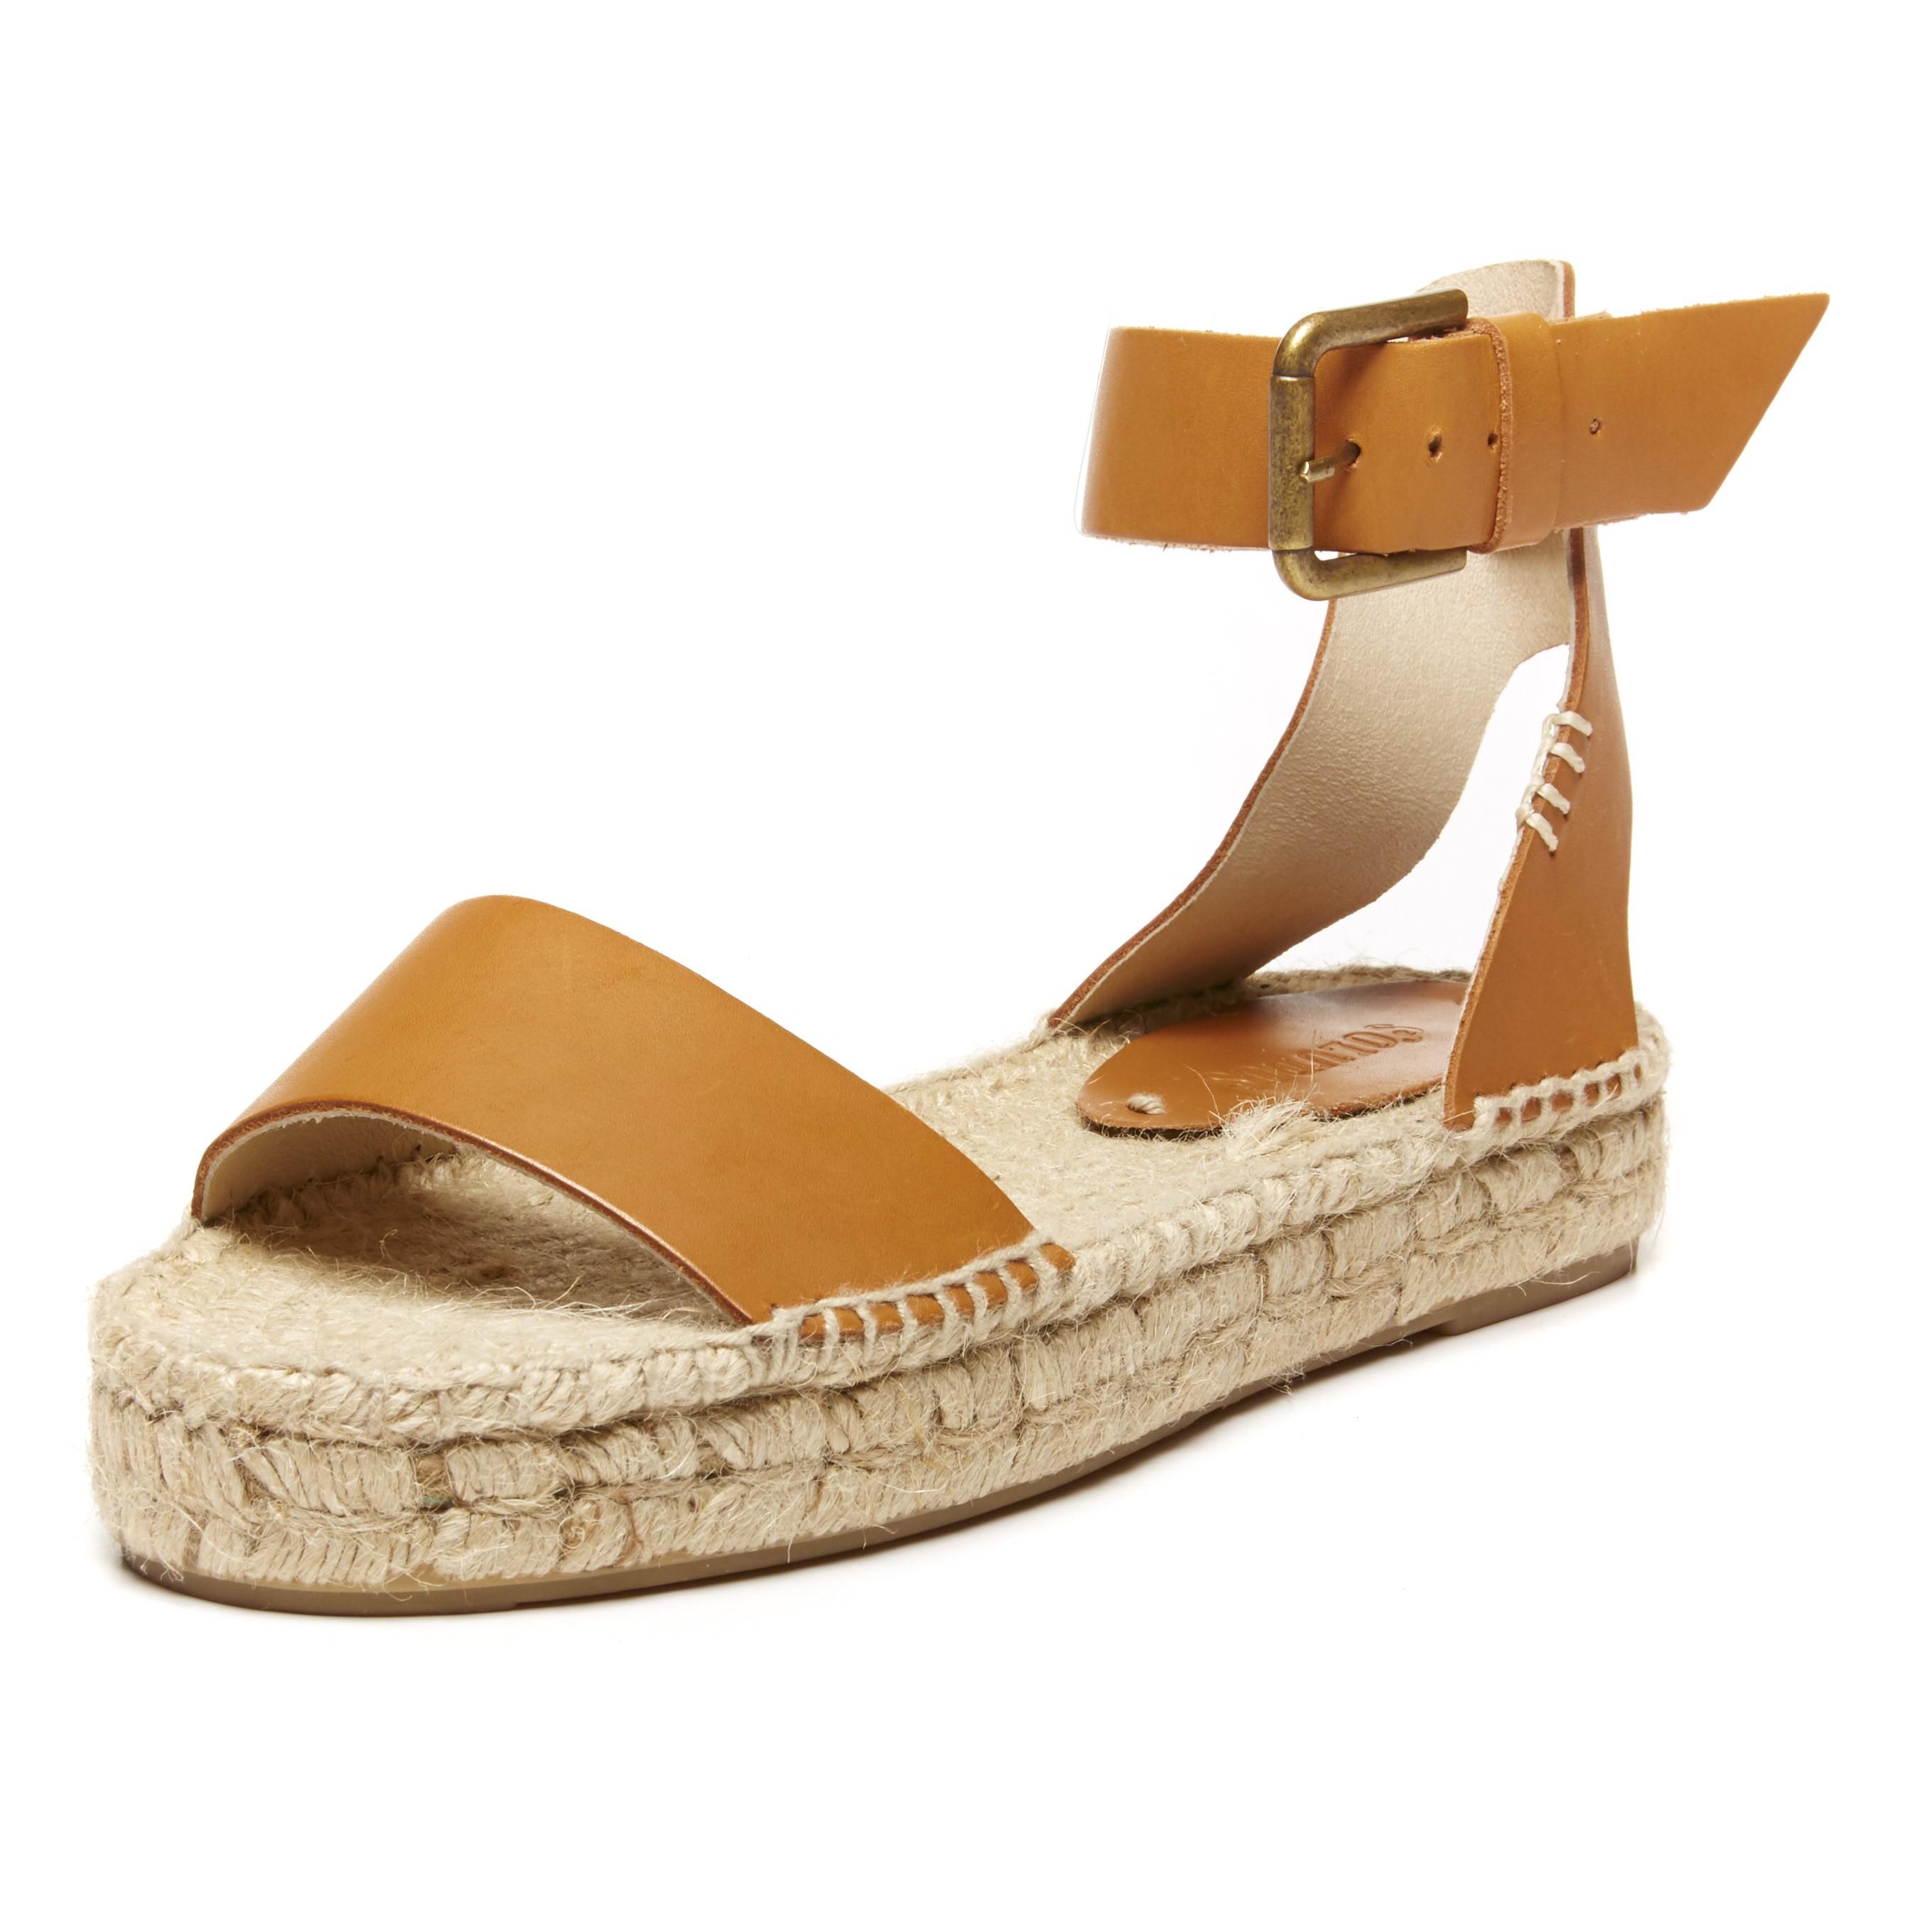 2438e55e165 Soludos Tan Leather Open Toe Platform Sandal - Soludos Espadrilles